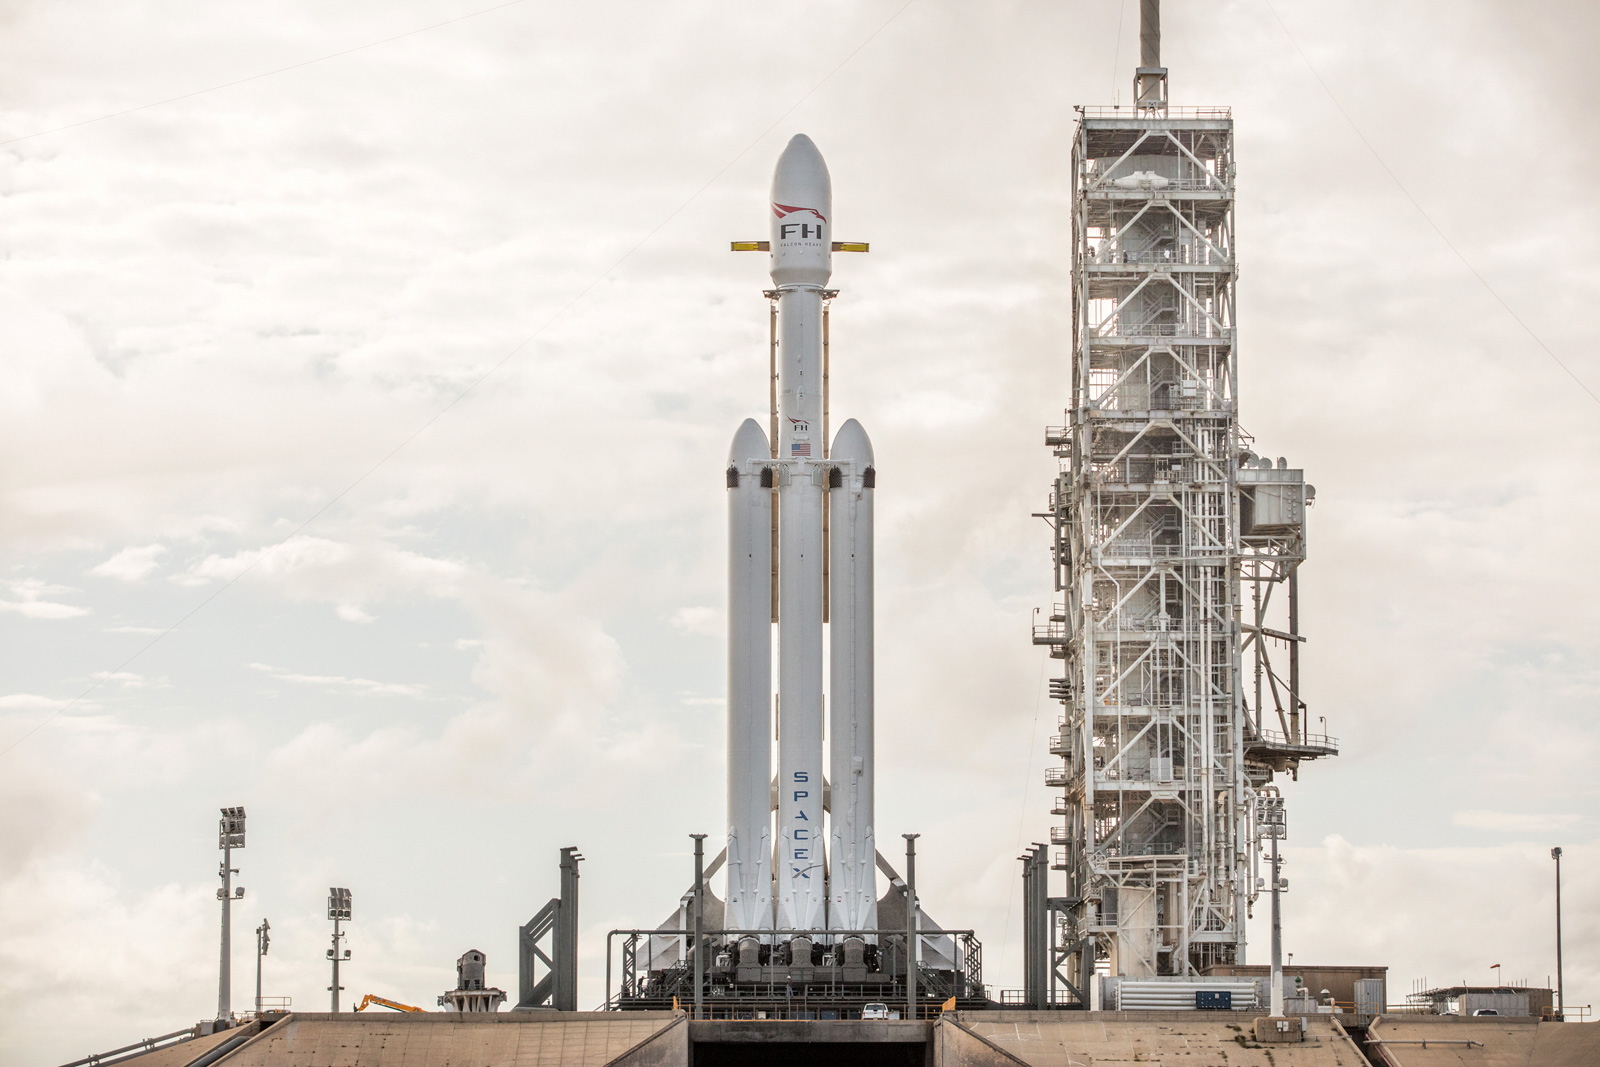 spacex-falcon-heavy-daytime-flickr.jpg